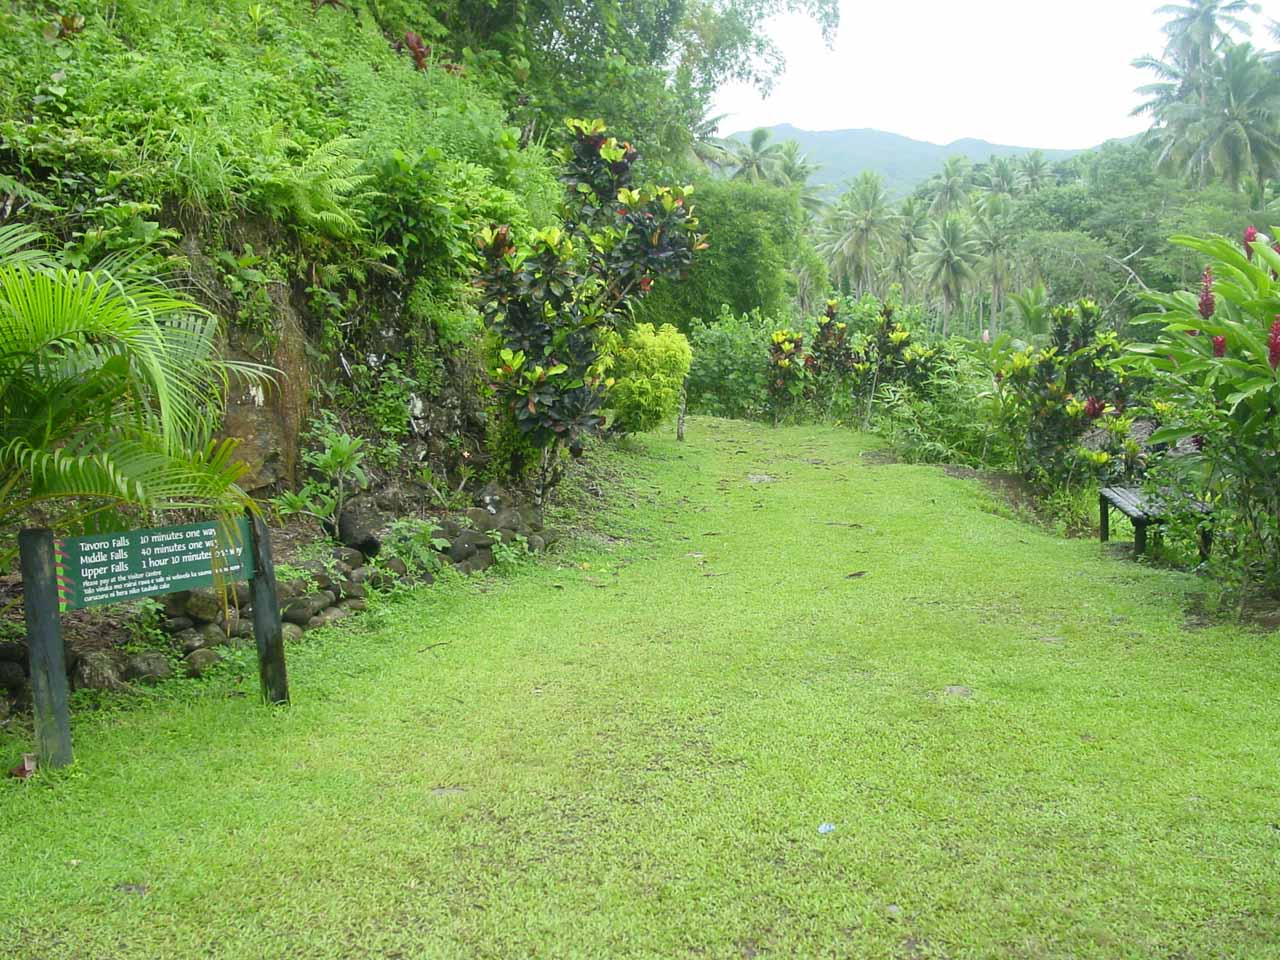 The grassy trail at the trailhead